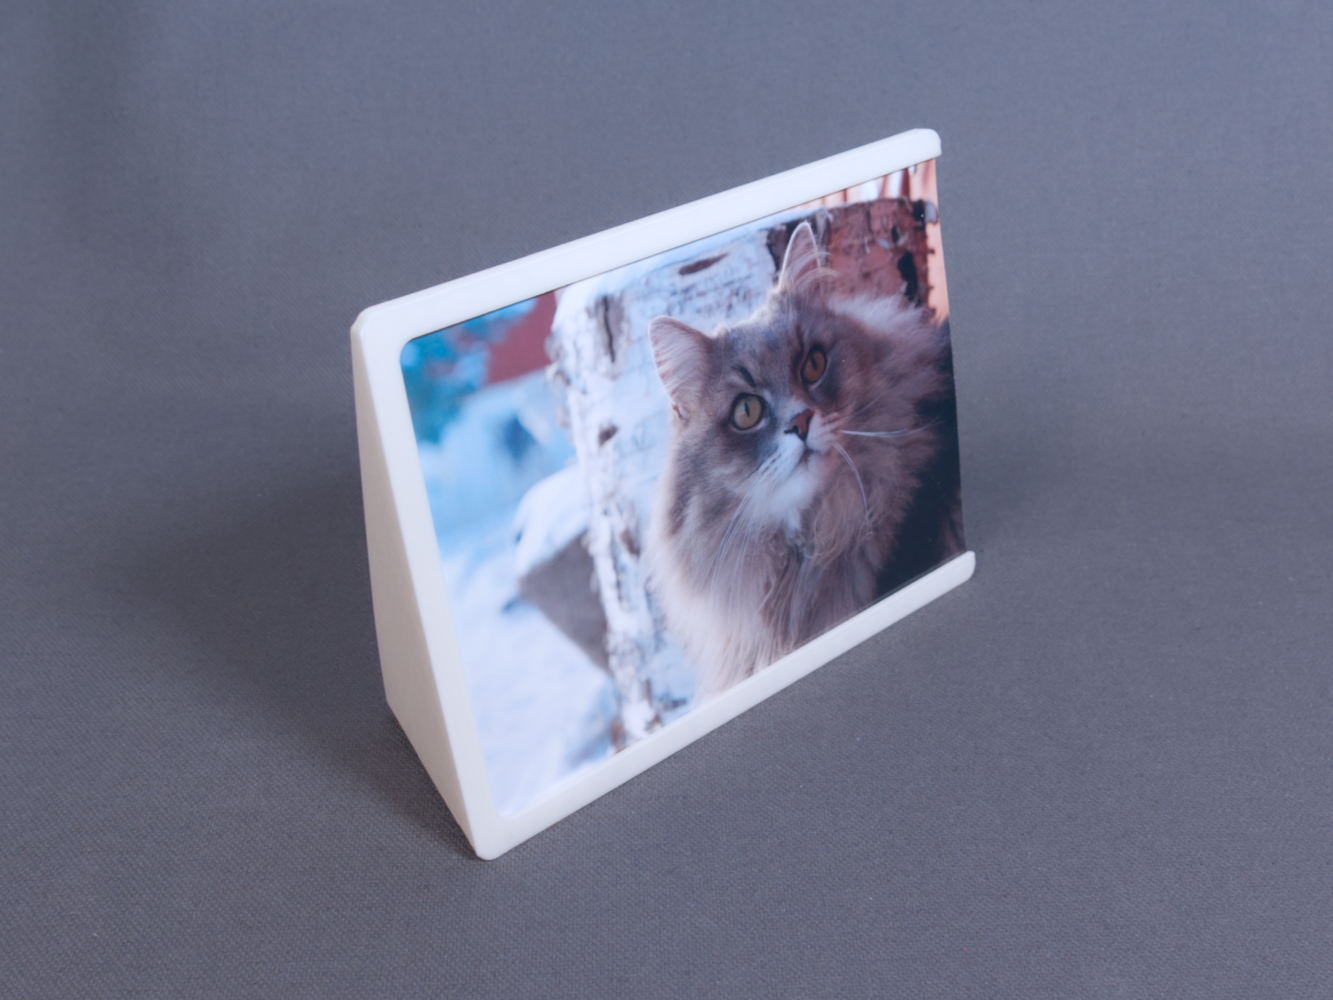 KIM01733.jpg Télécharger fichier STL Cadre photo, 148mm x 100mm • Objet à imprimer en 3D, Kimframes